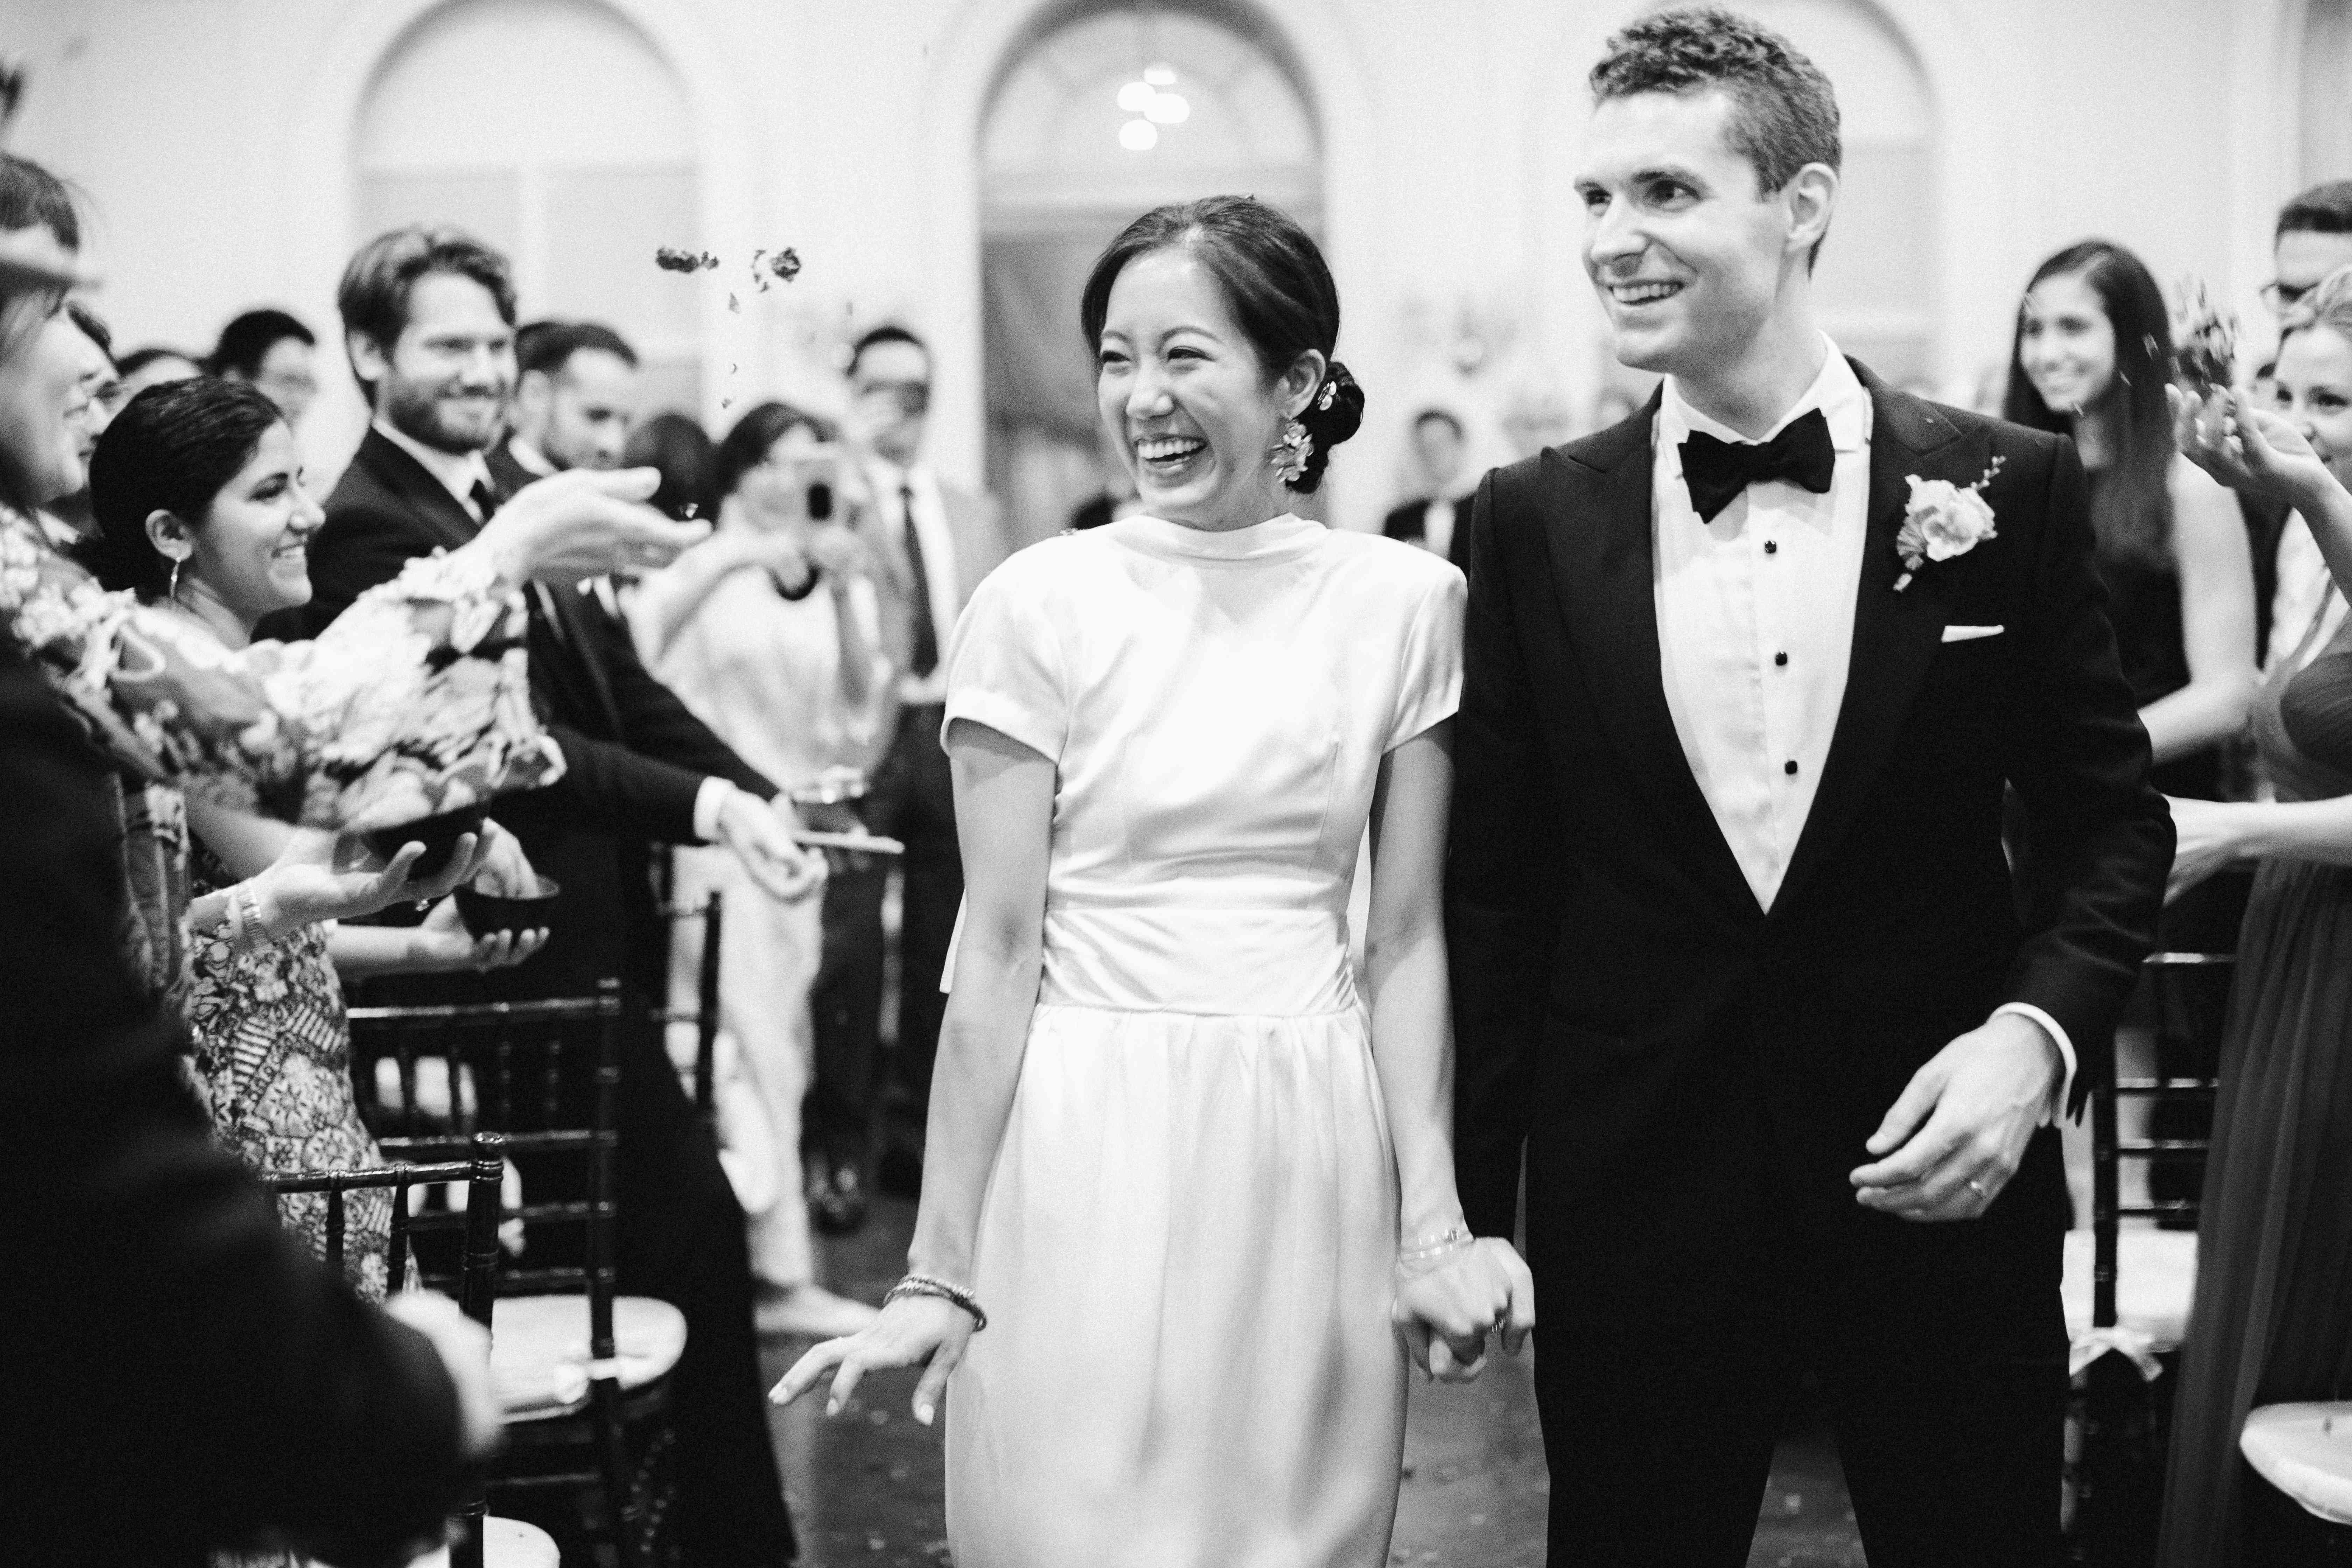 Couple recesses down the aisle